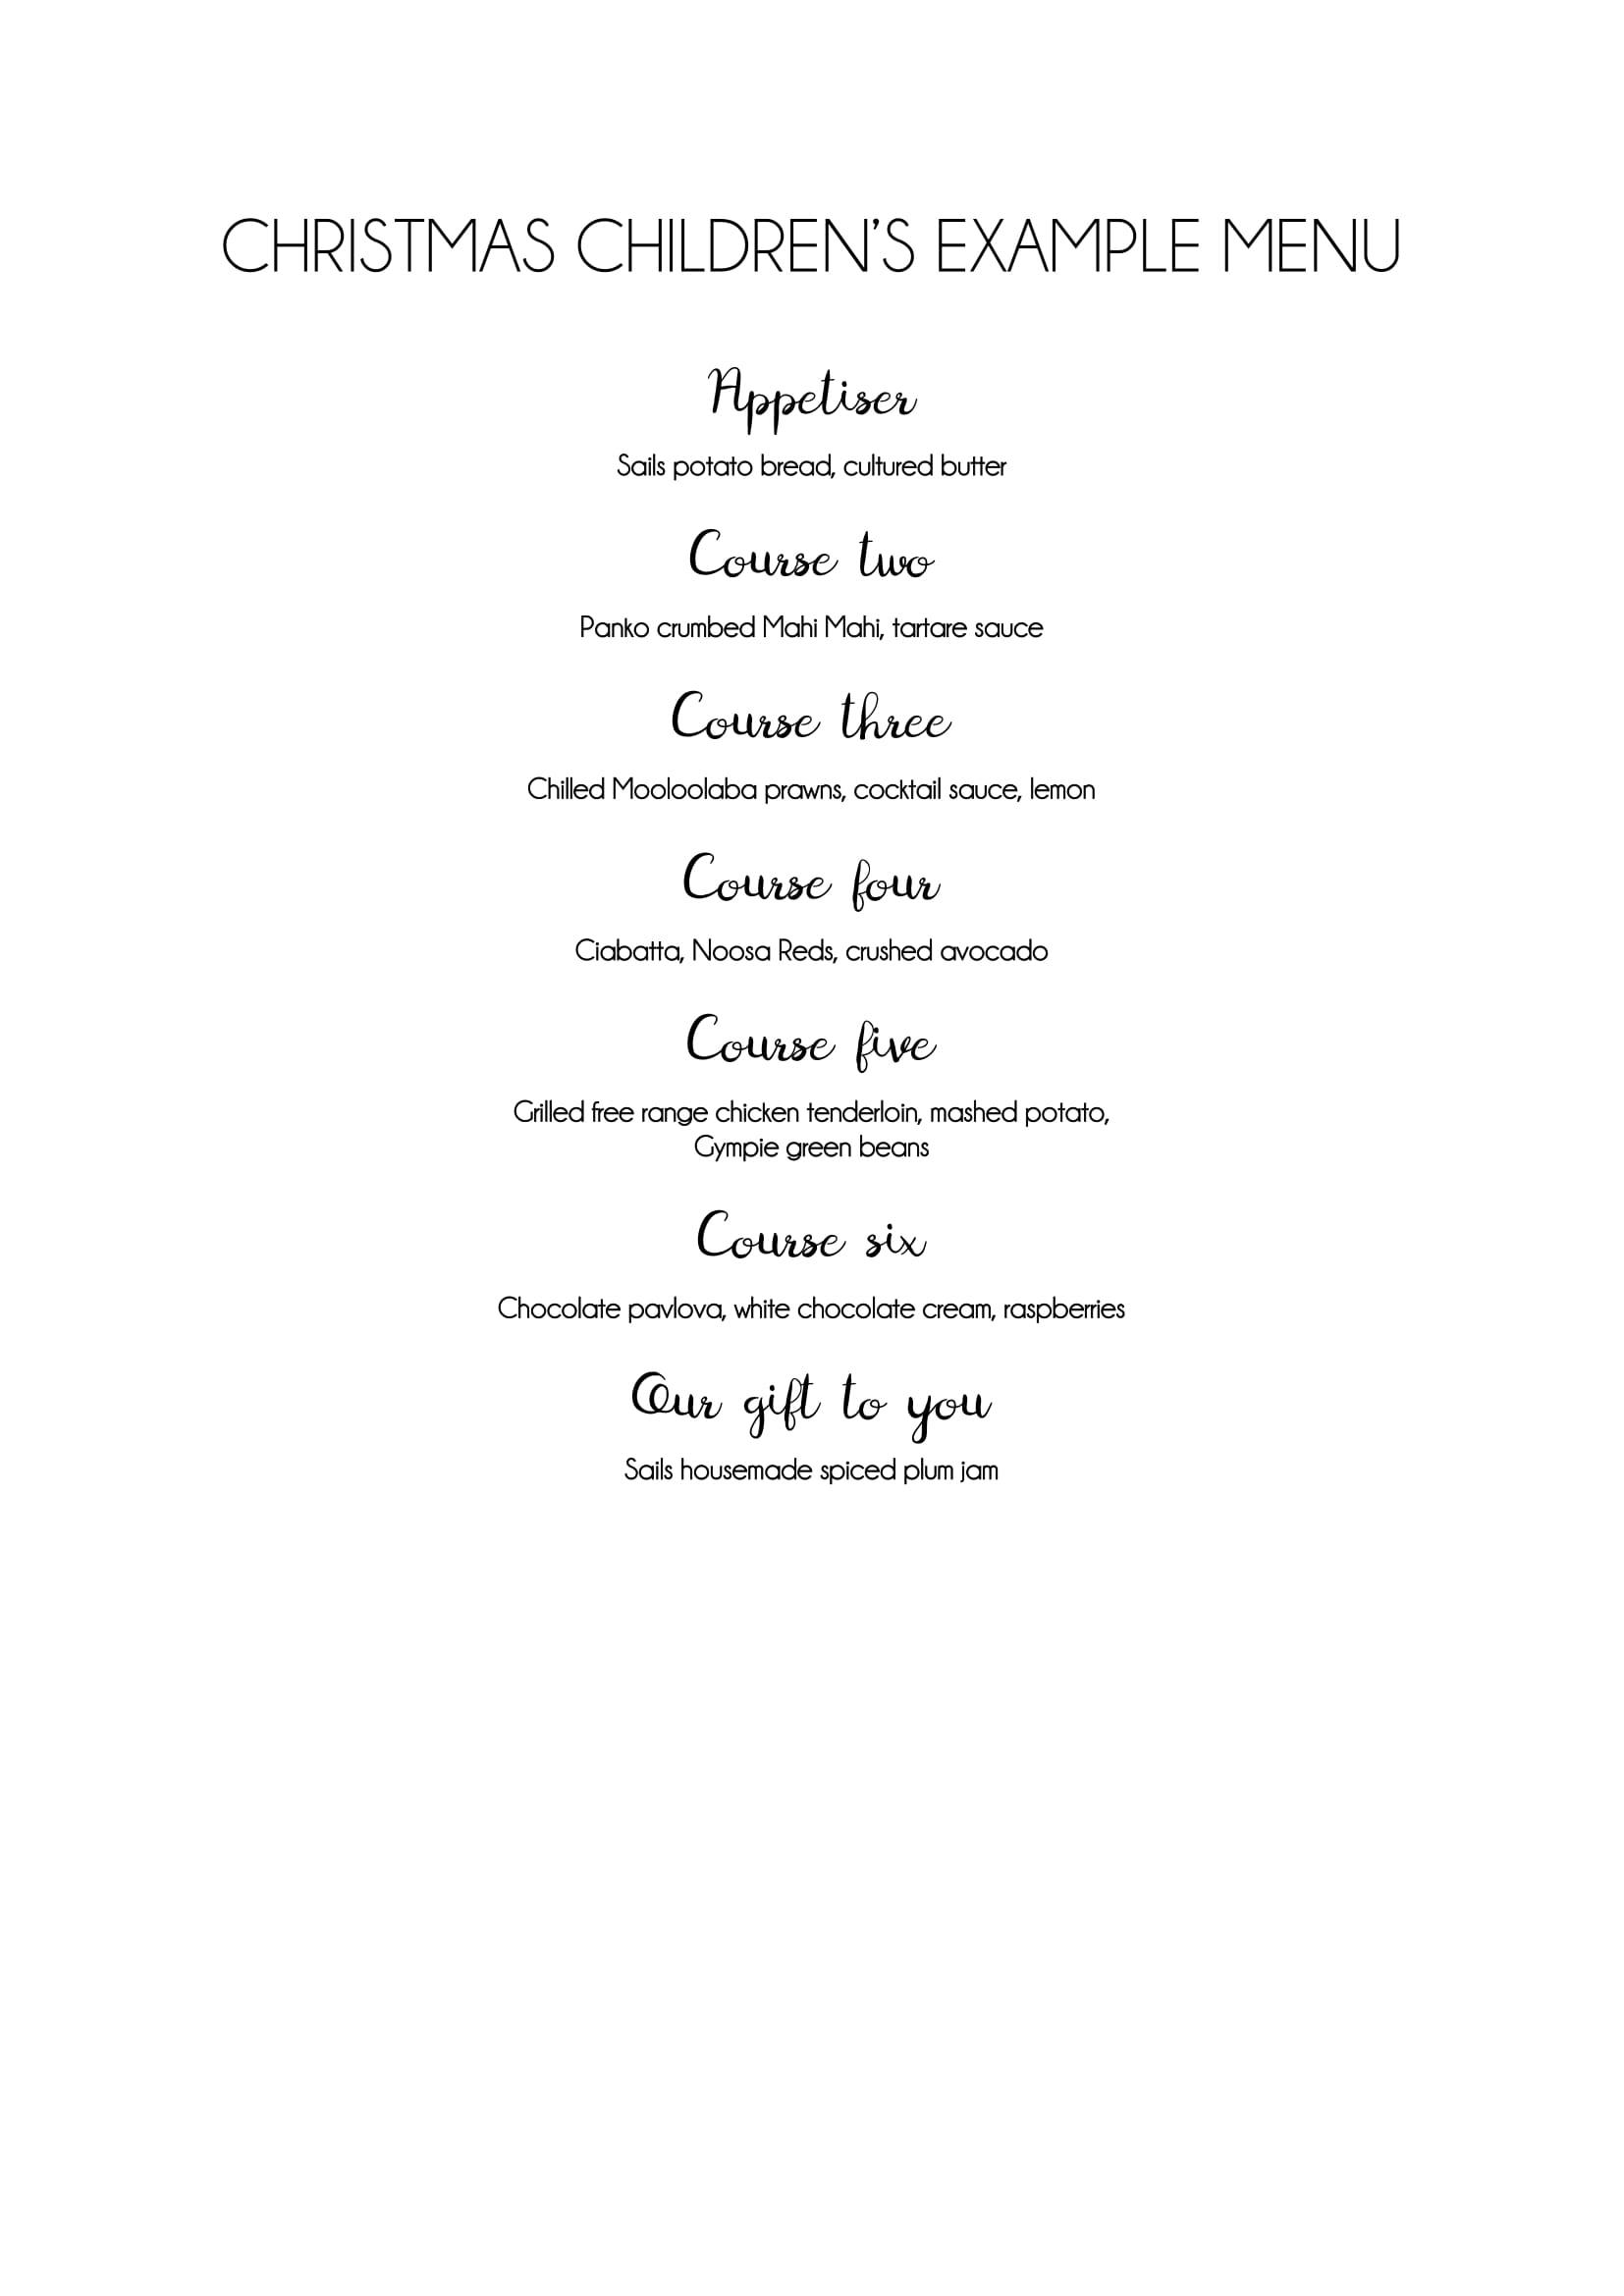 CHRISTMAS Childrens example menu-1